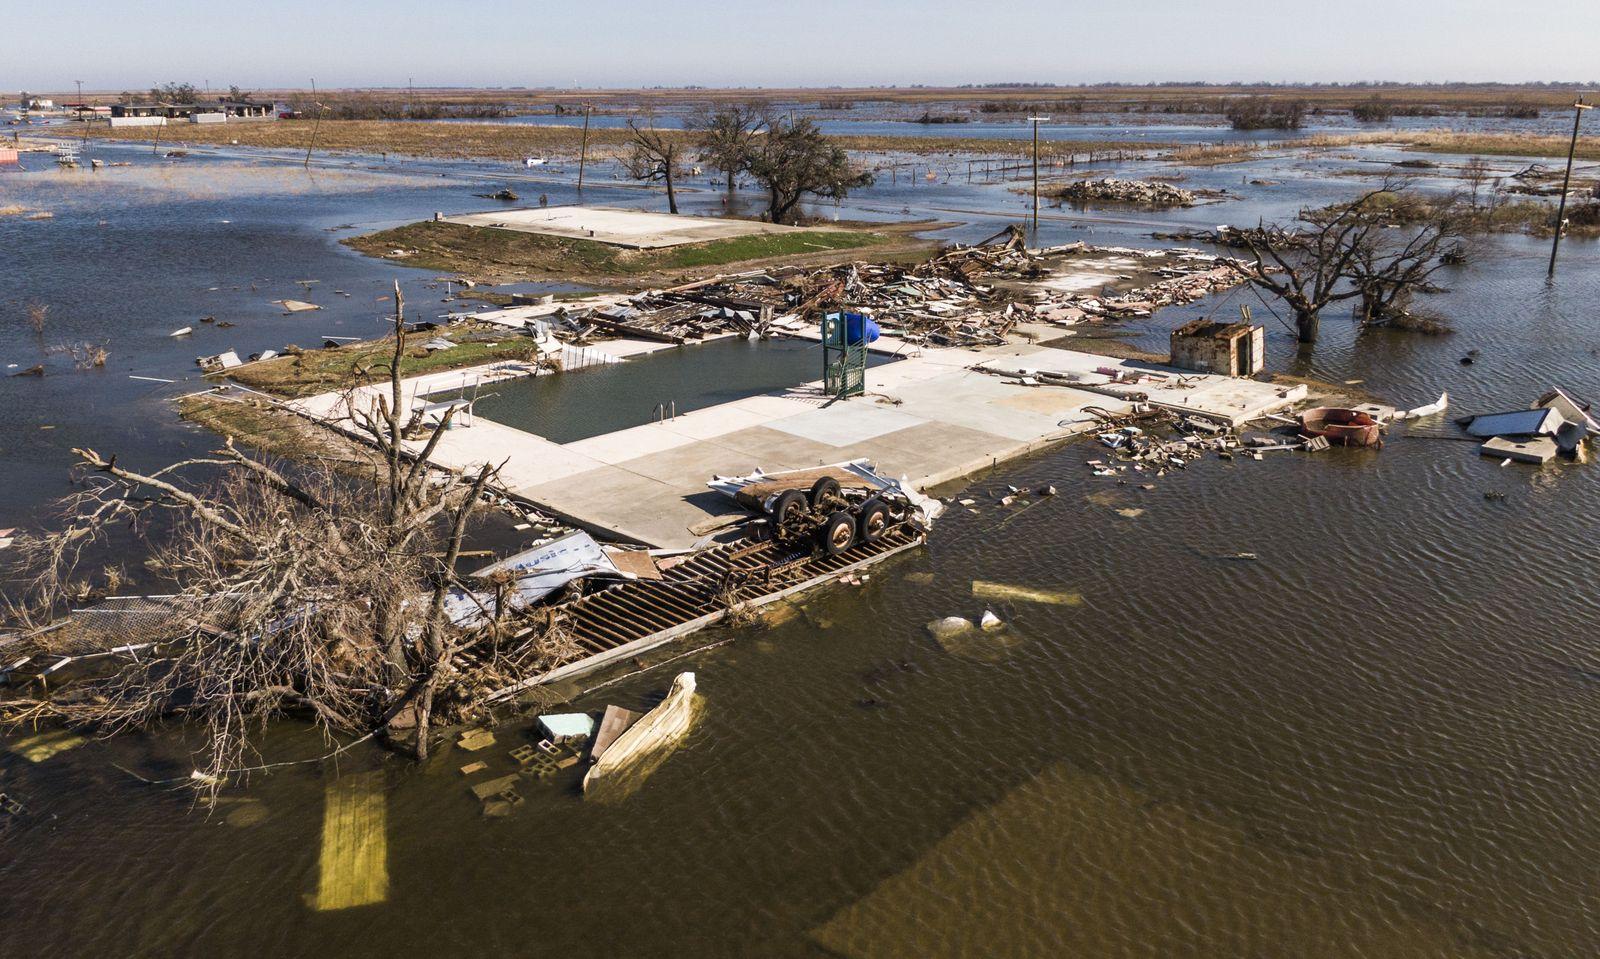 Hurricane Delta aftermath, Cameron, USA - 10 Oct 2020